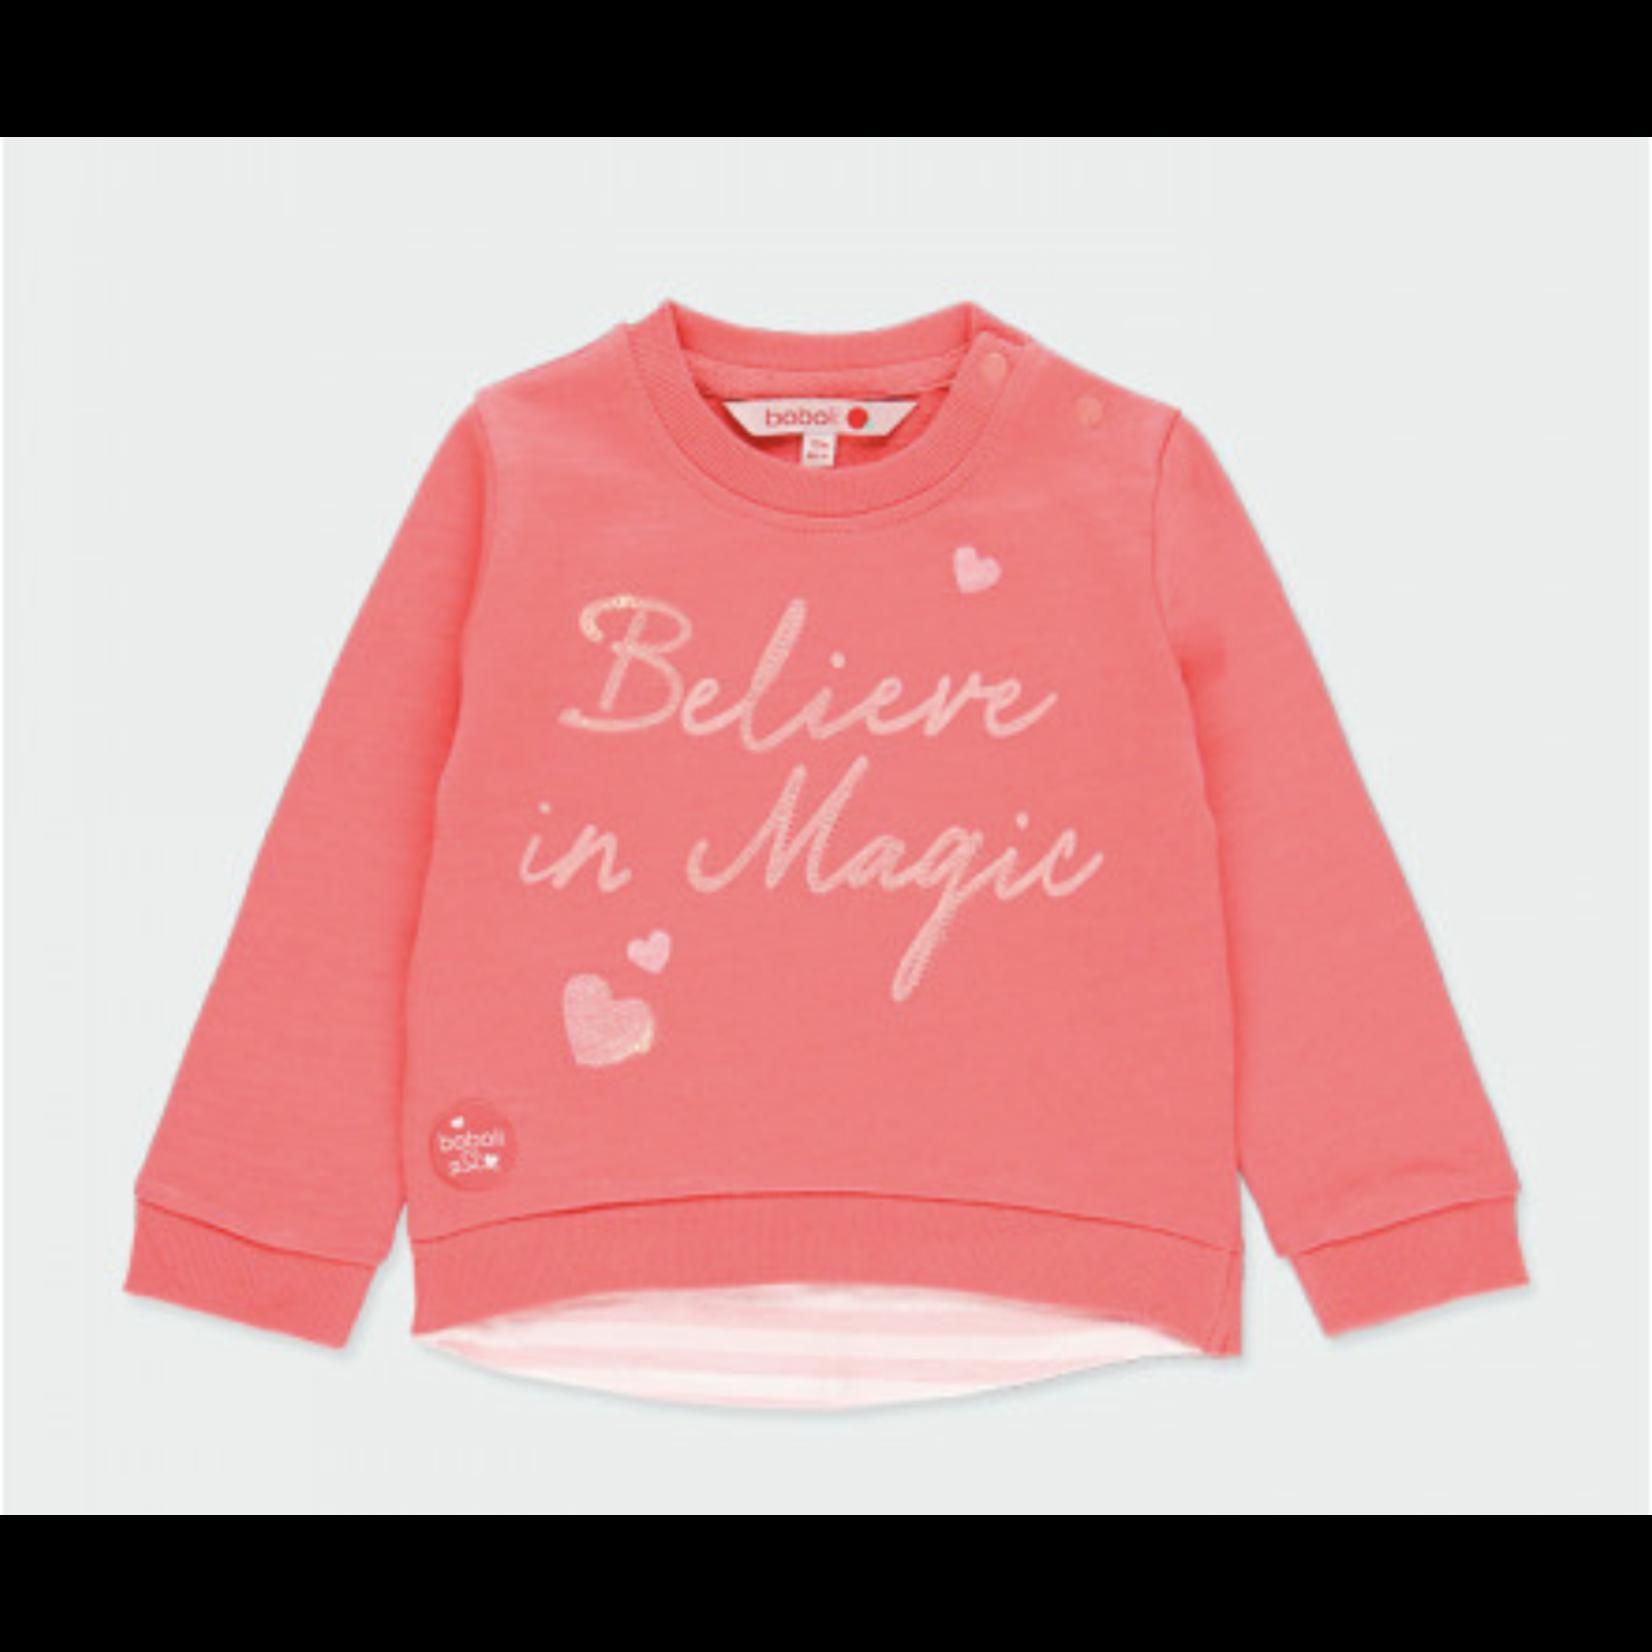 Bóboli Sweatshirt for girl